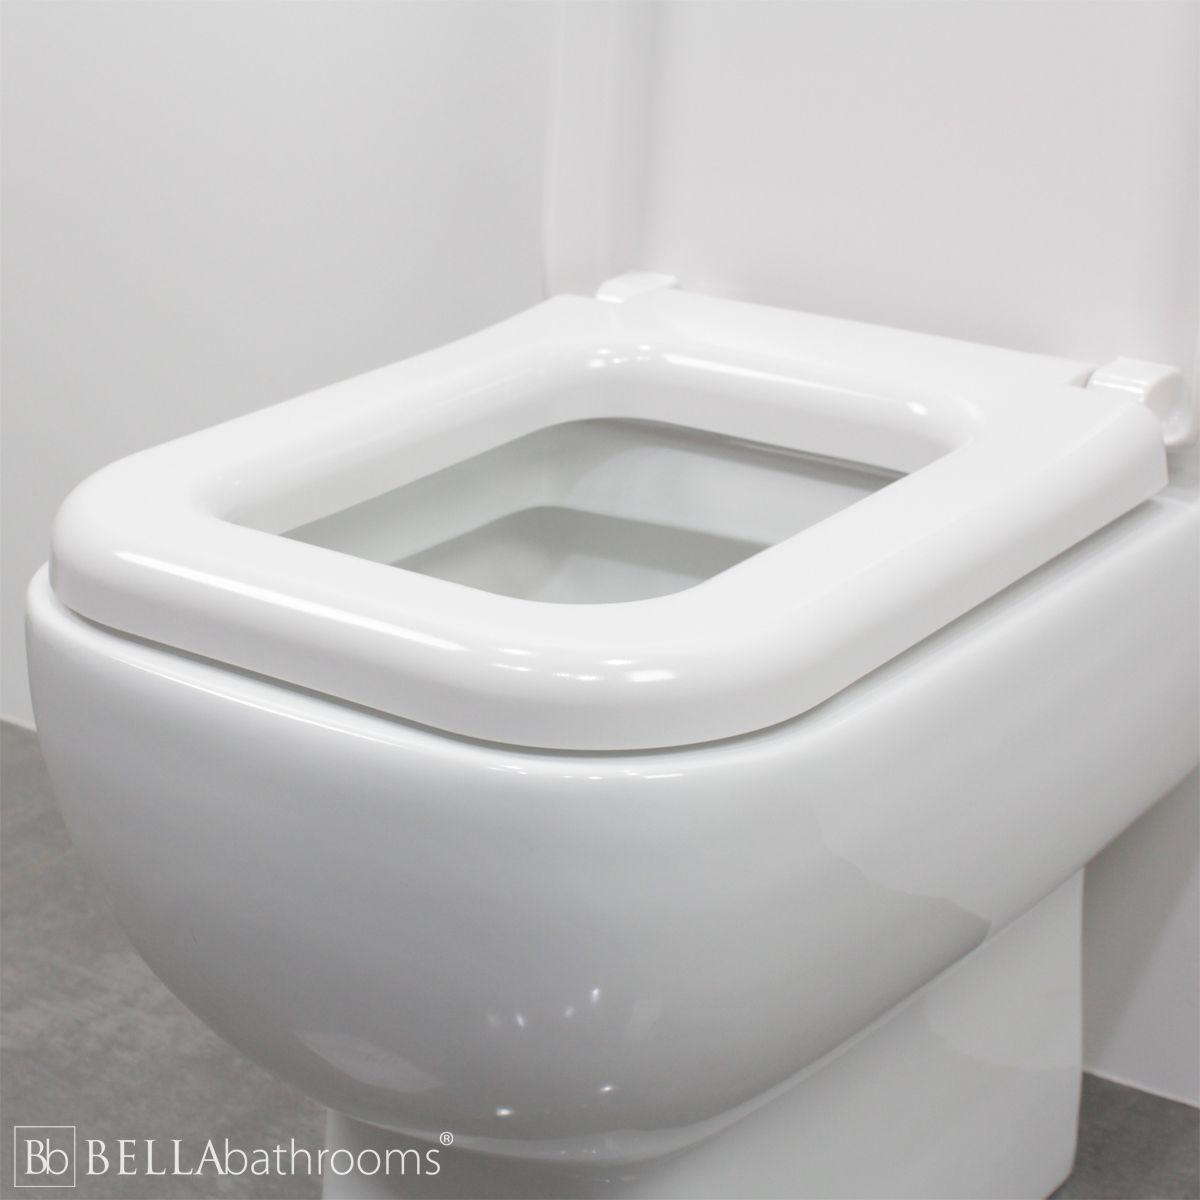 RAK Series 600 Standard Wrap Over Toilet Seat Rim